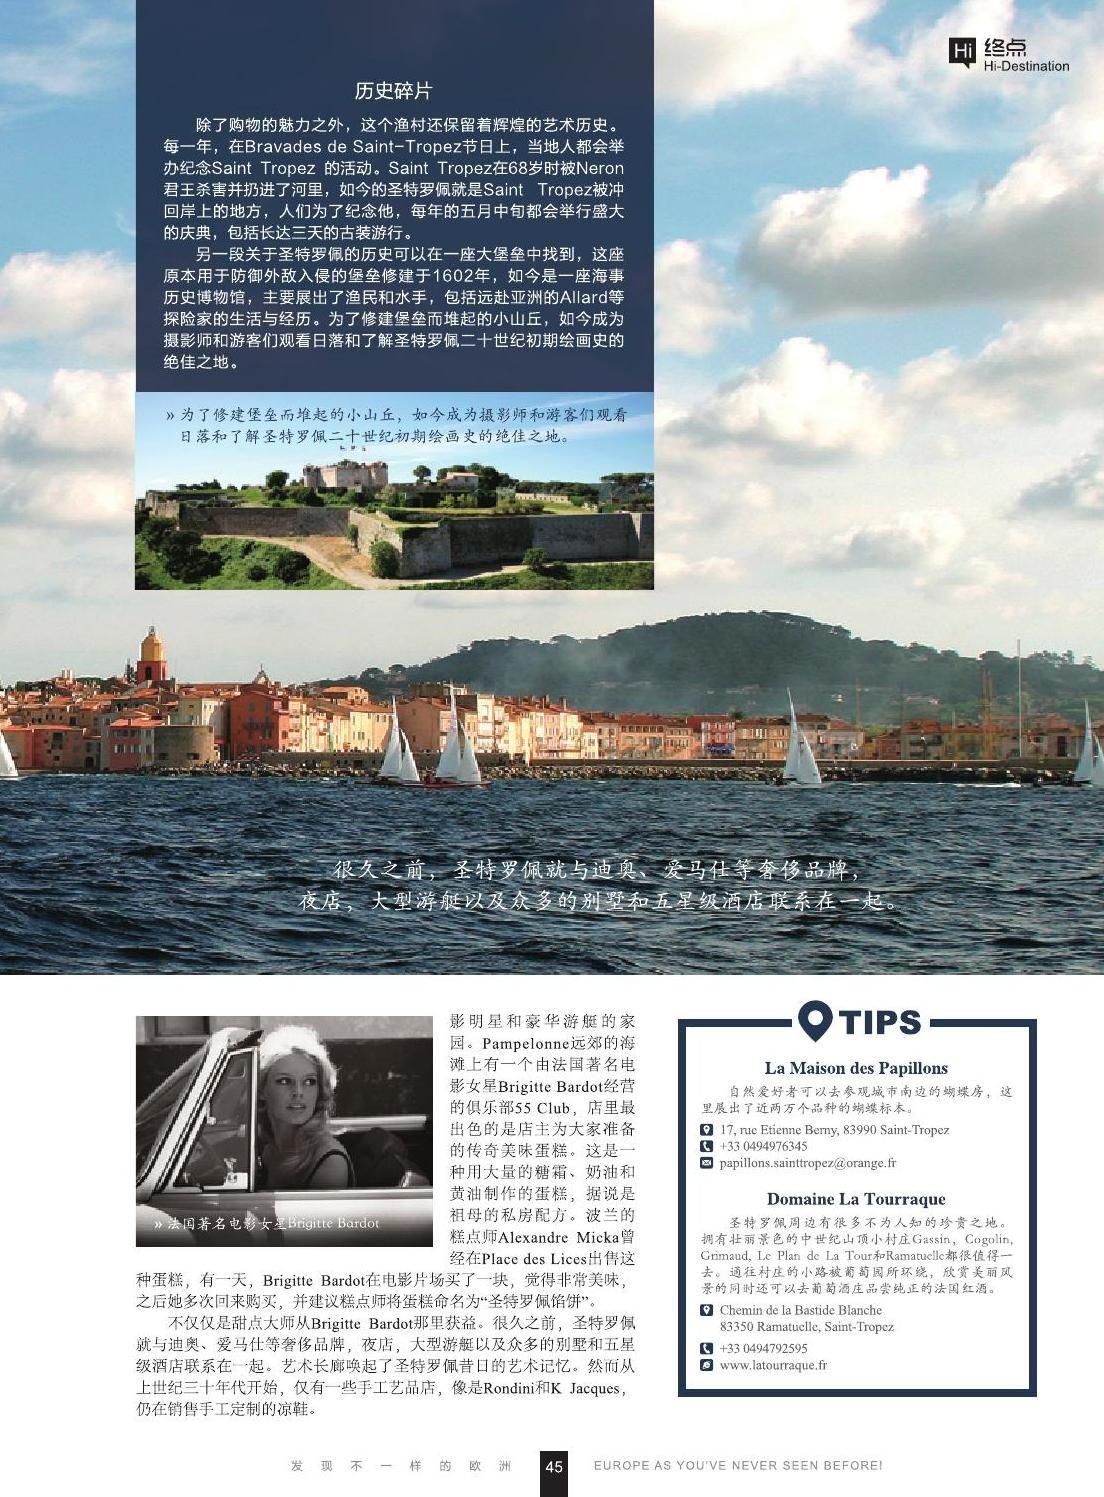 Hieur E14 Feb2016 Travel Magazines Travel Europe